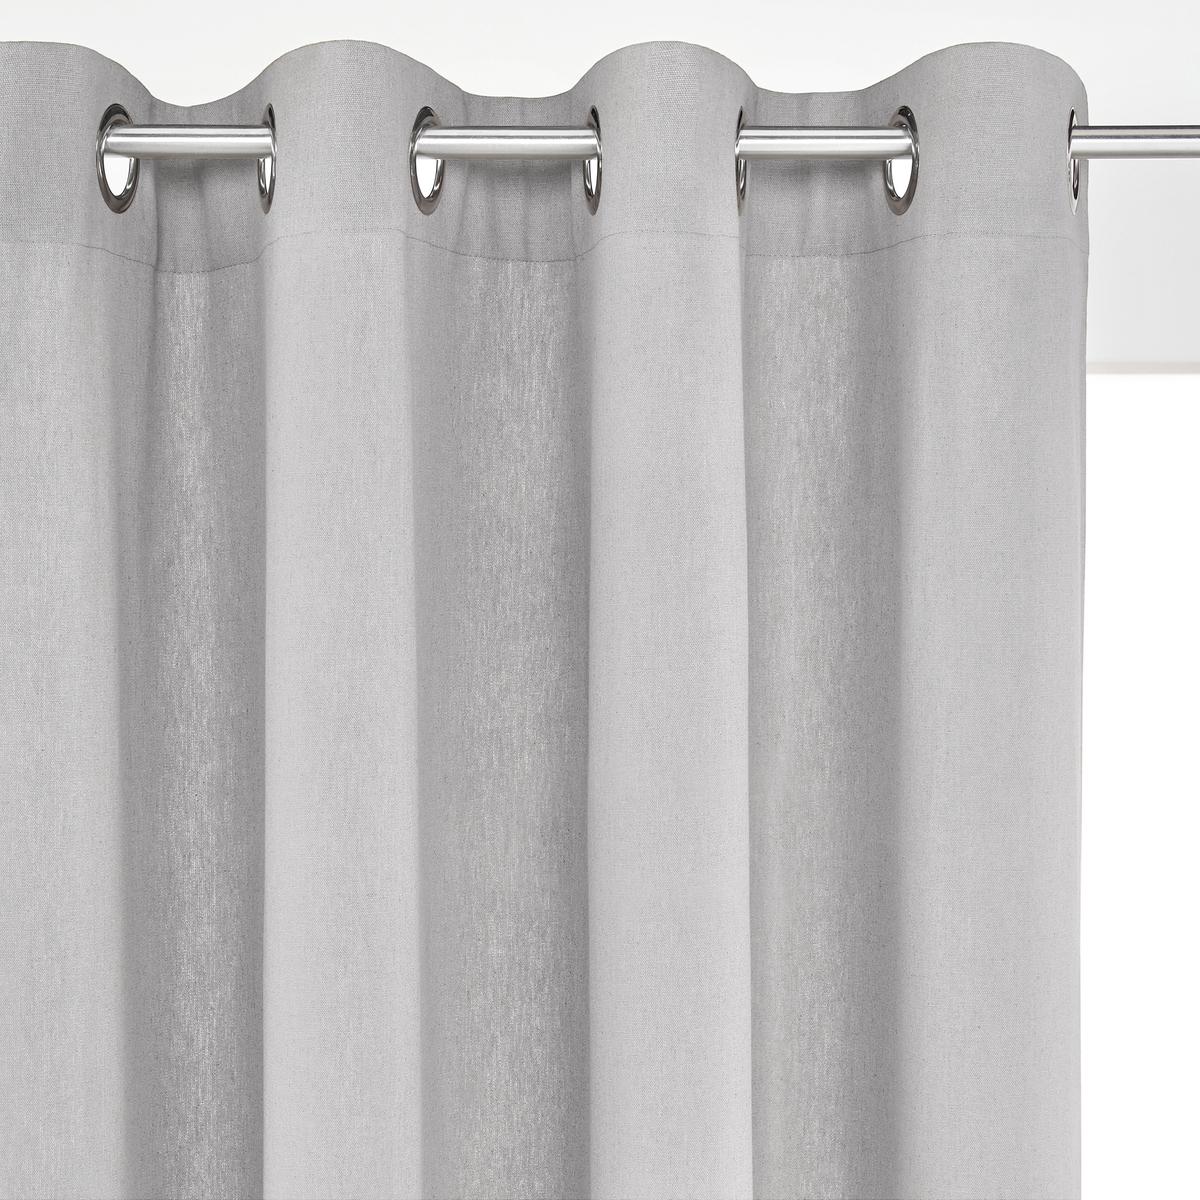 цена на Штора La Redoute С люверсами из льна и хлопка TAMA 220 x 150 см серый